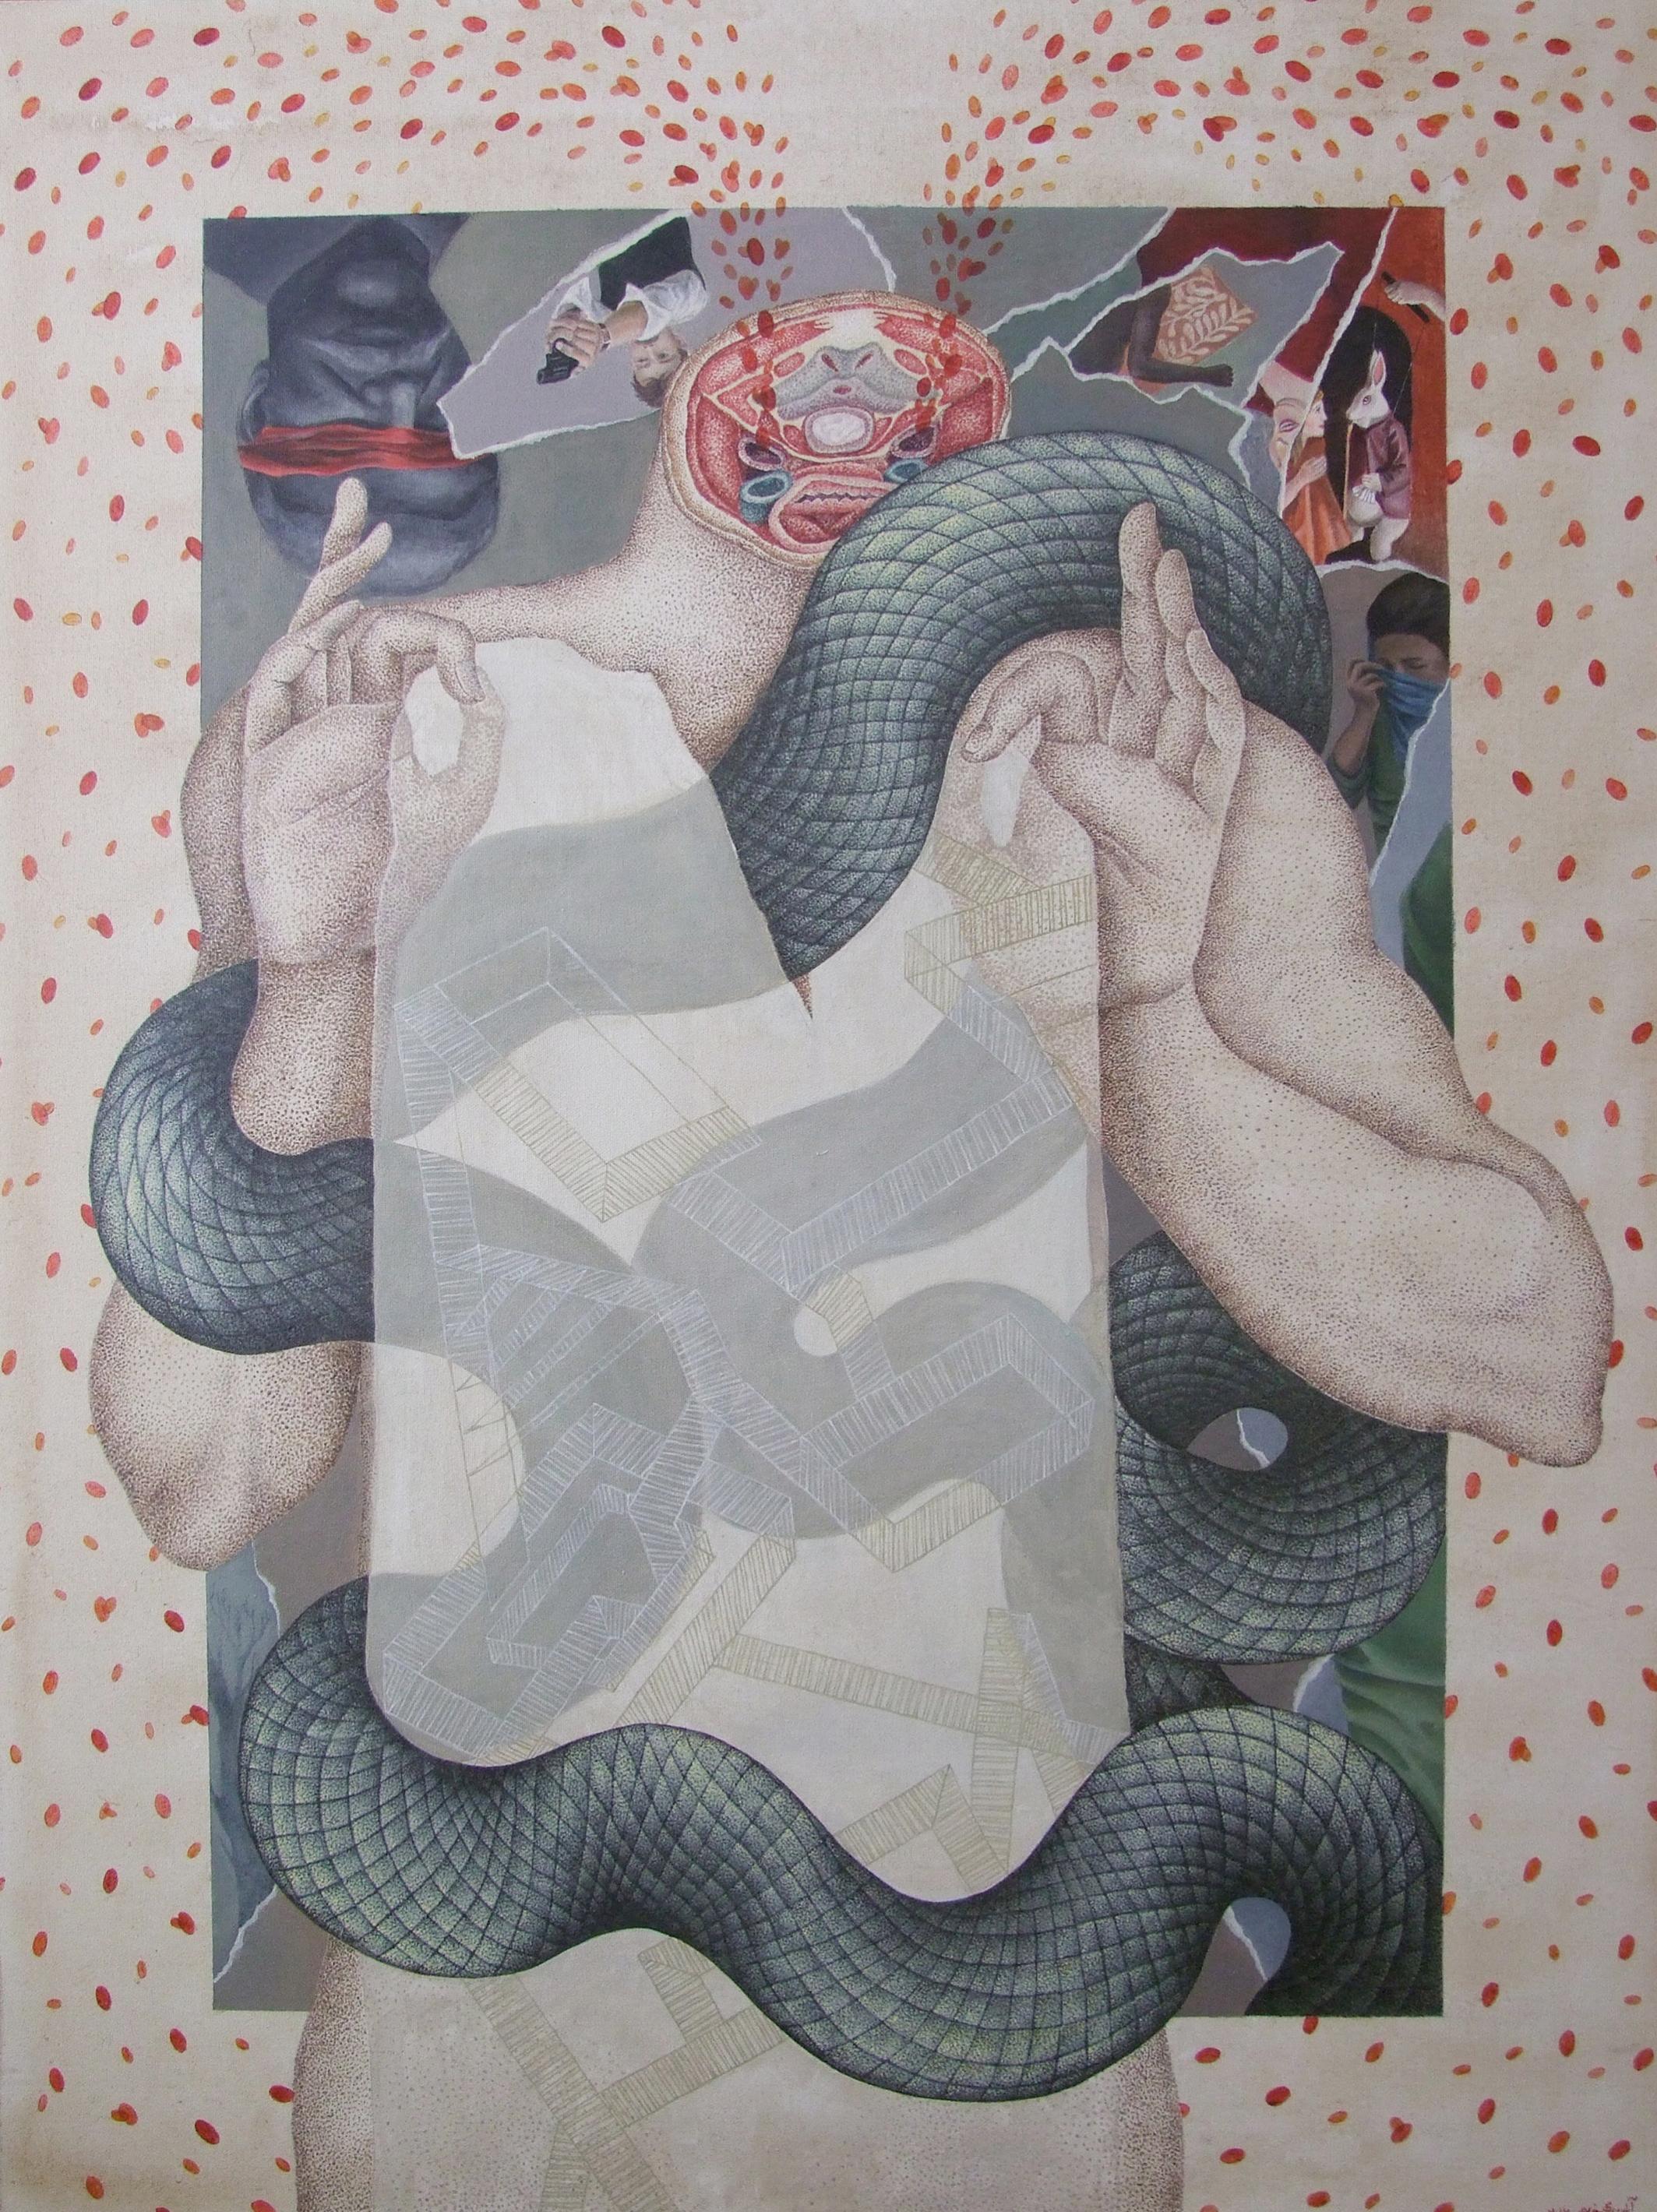 Wonderland , 30x40 inch, acrylic and tea on canvas, 2016